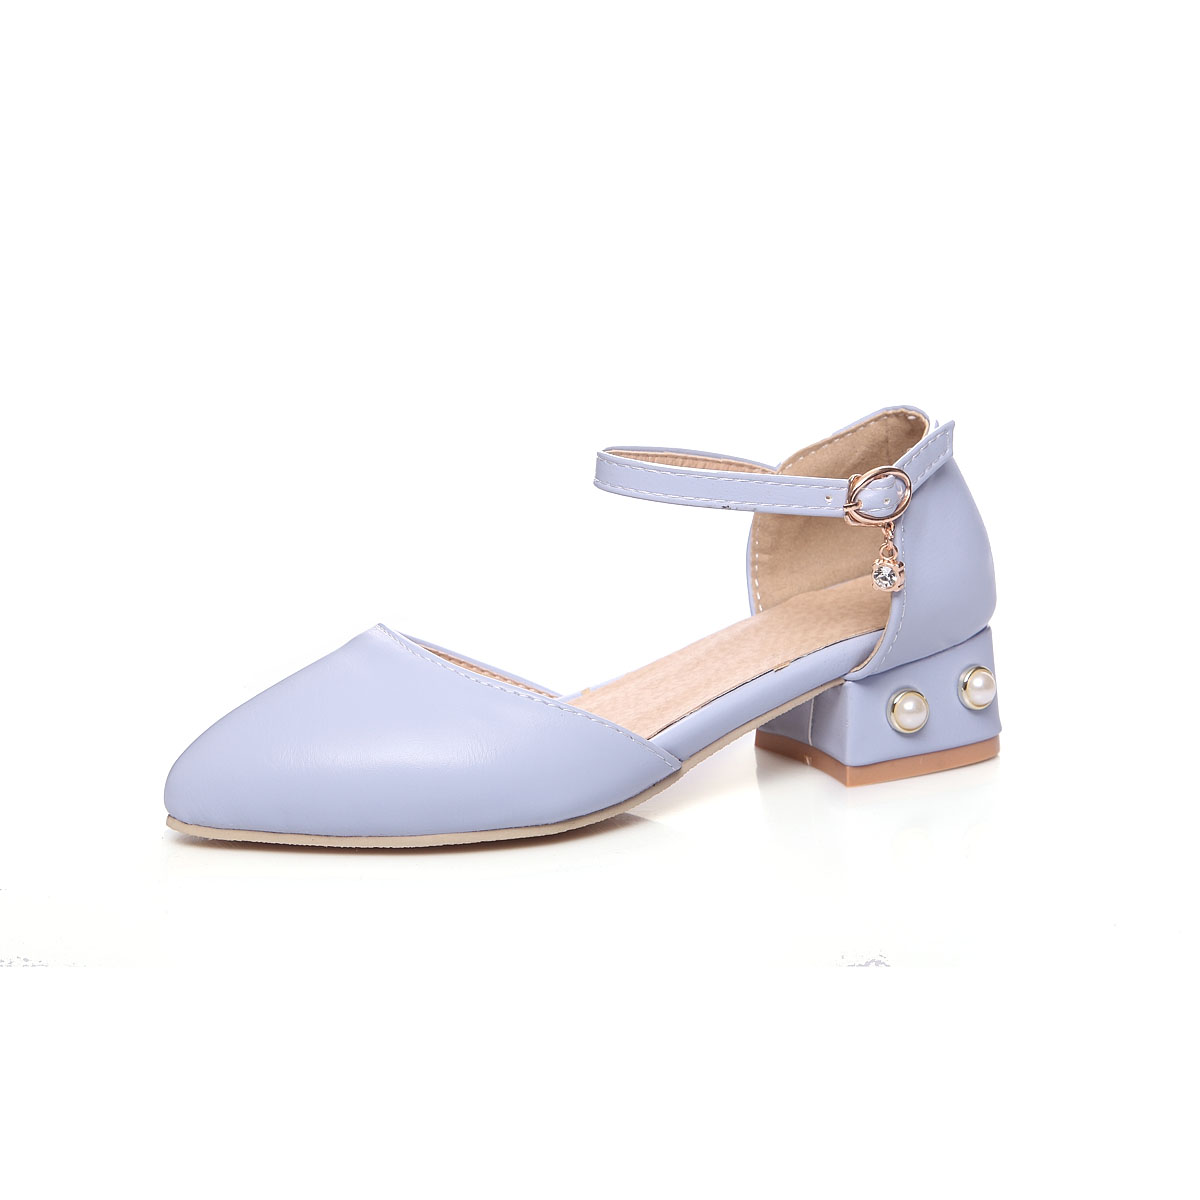 Ldhzxc New Femmes Sangle Sandales Bout Talon blanc Doux Loisirs rose Chaussures Bleu 2018 Boucle Carré Sweety r5tIwv5x